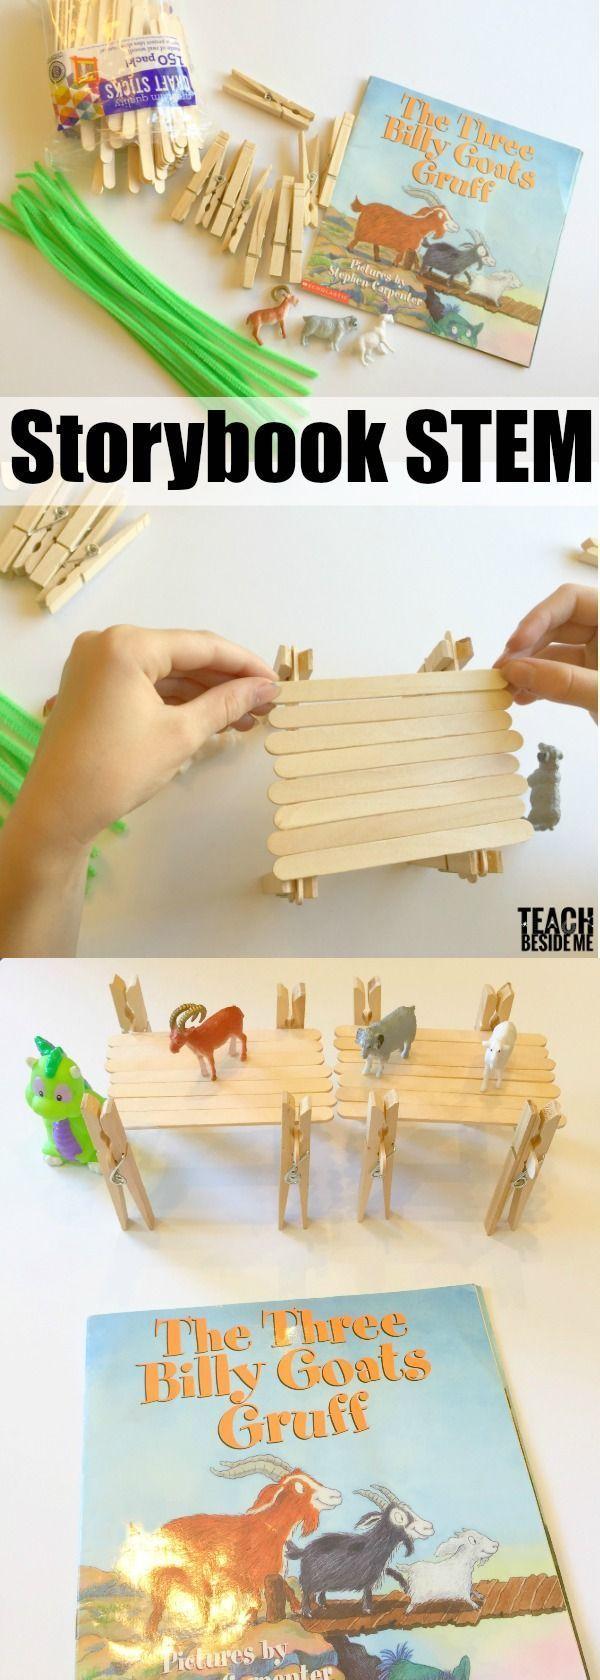 Three Billy Goats Gruff Storybook STEM- bridge building activity via @karyntripp